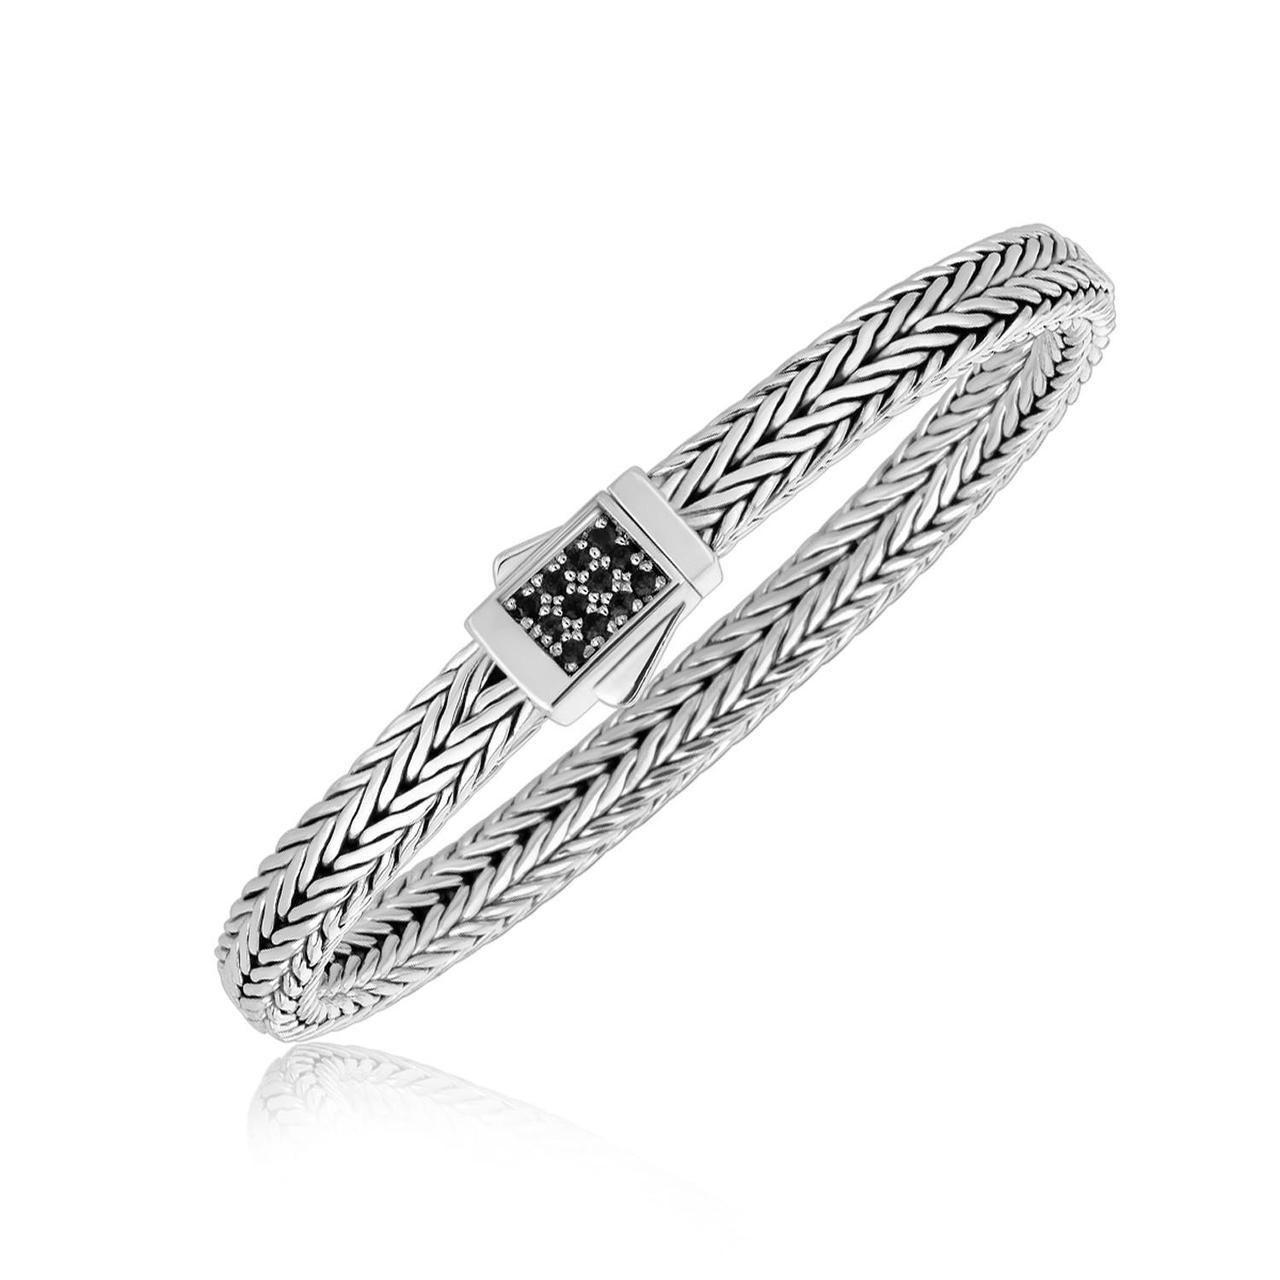 Sterling Silver Braided Black Sapphire Accented Men's Bracelet - 70464-7.5